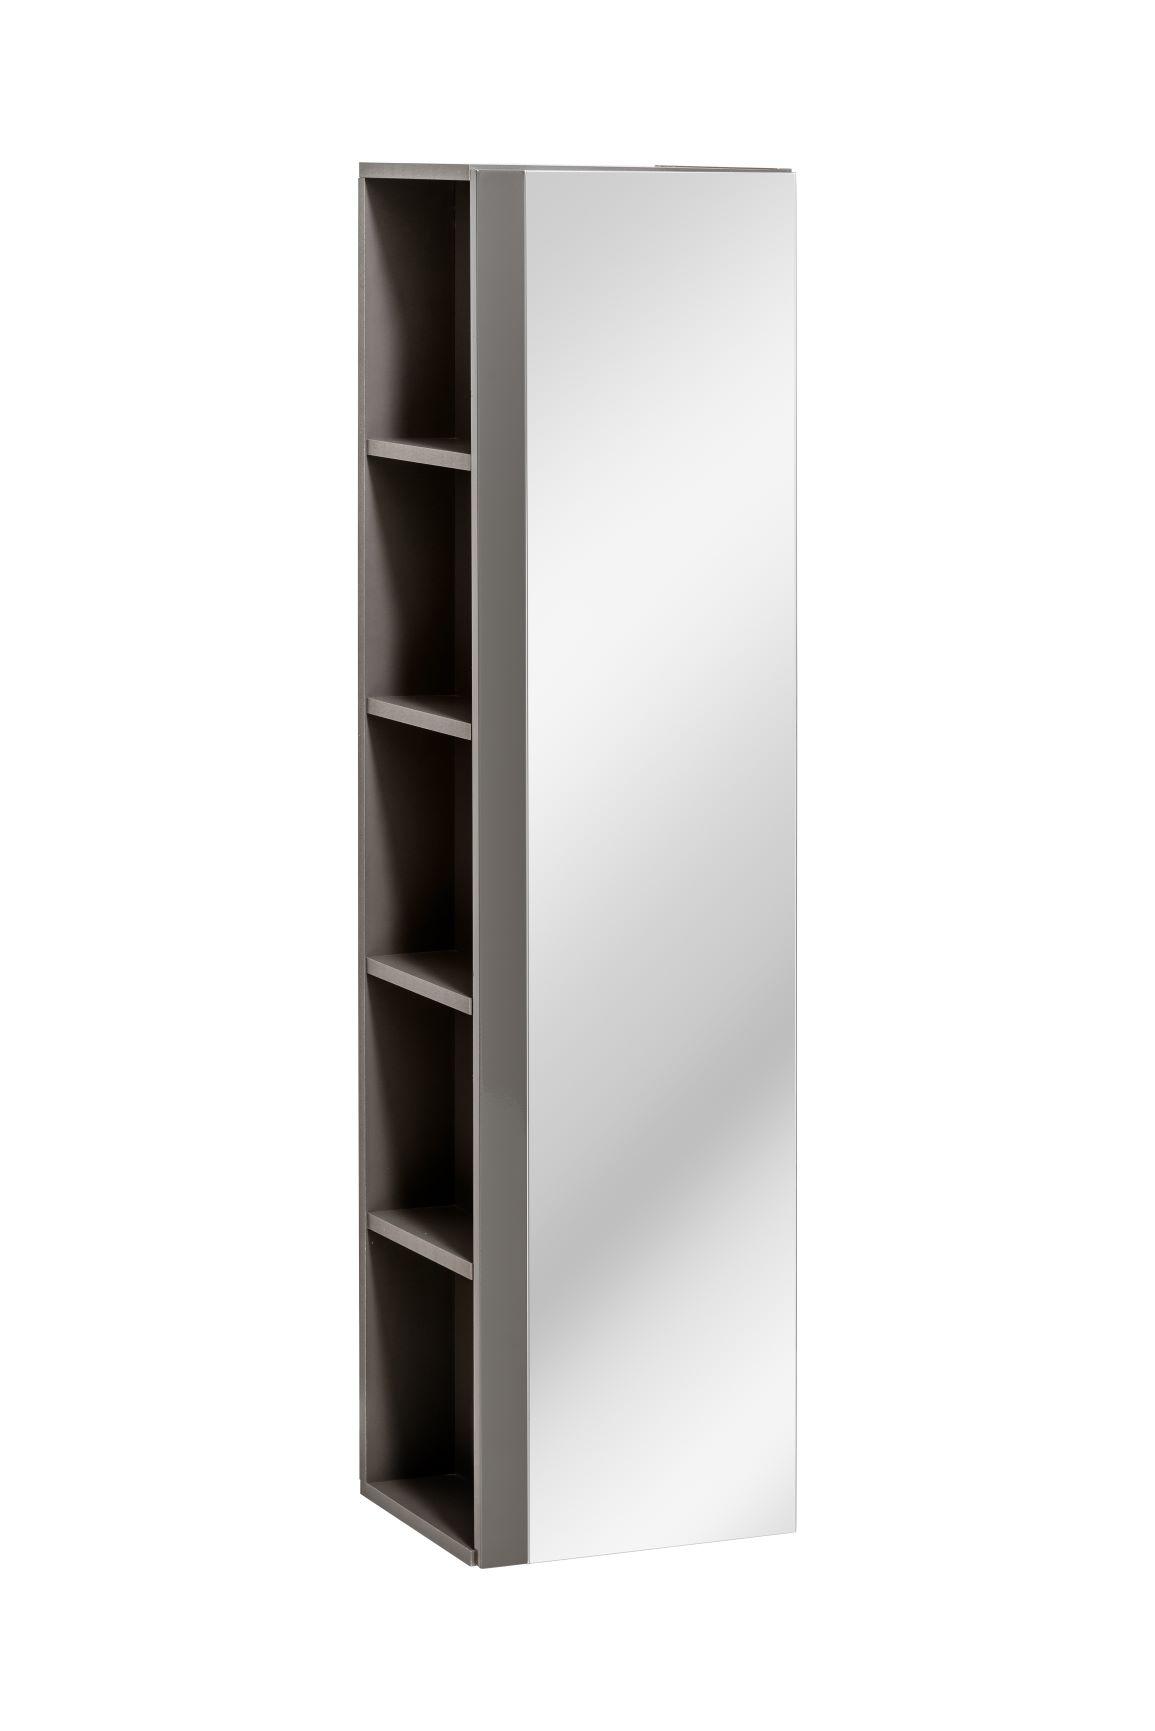 Dulap baie inalt cu 1 usa si oglinda Twist Grey l35xA30xH140 cm